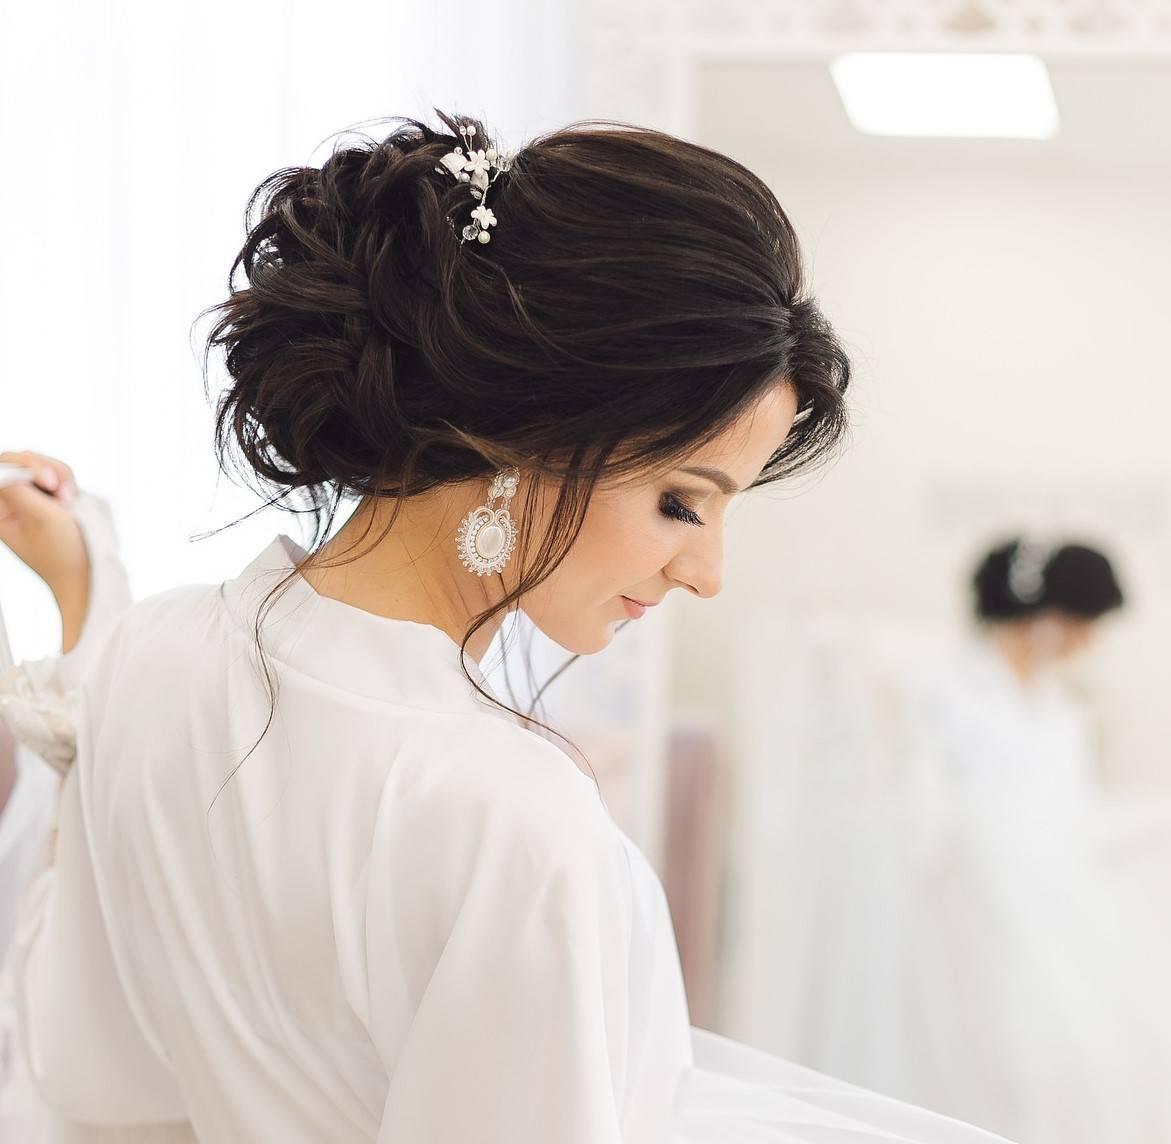 salon de coiffure pour mariage lyon - salon de coiffure